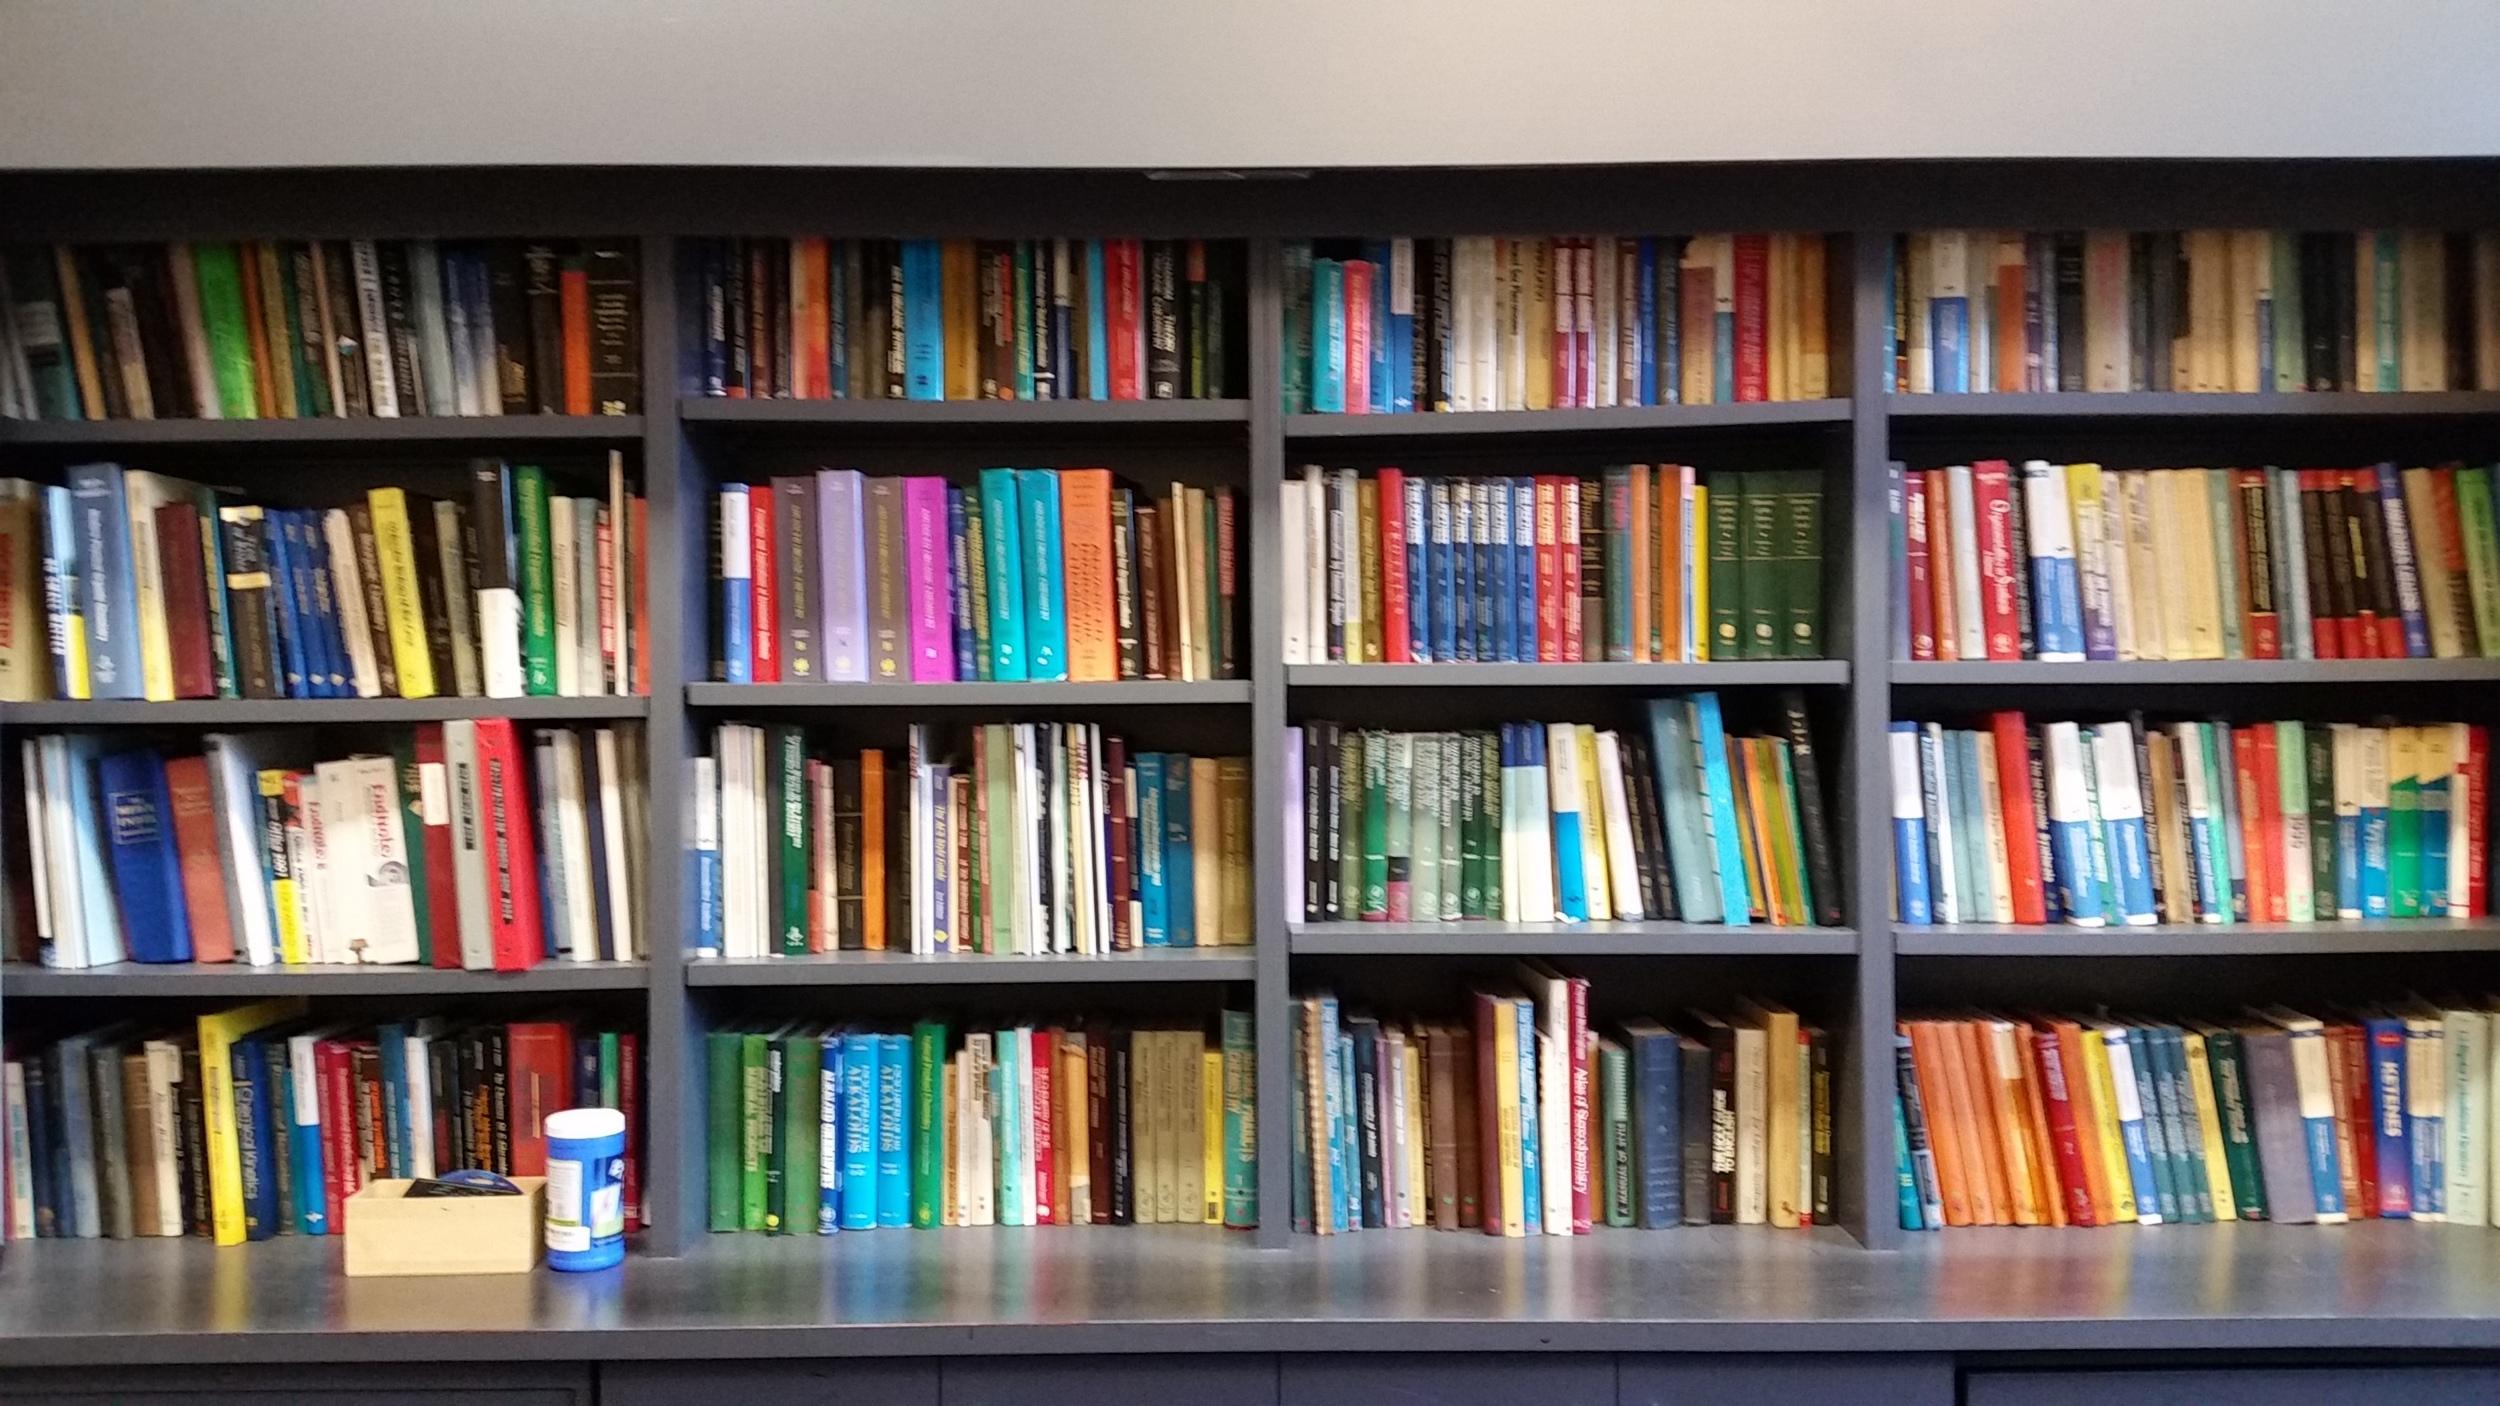 Evan's library